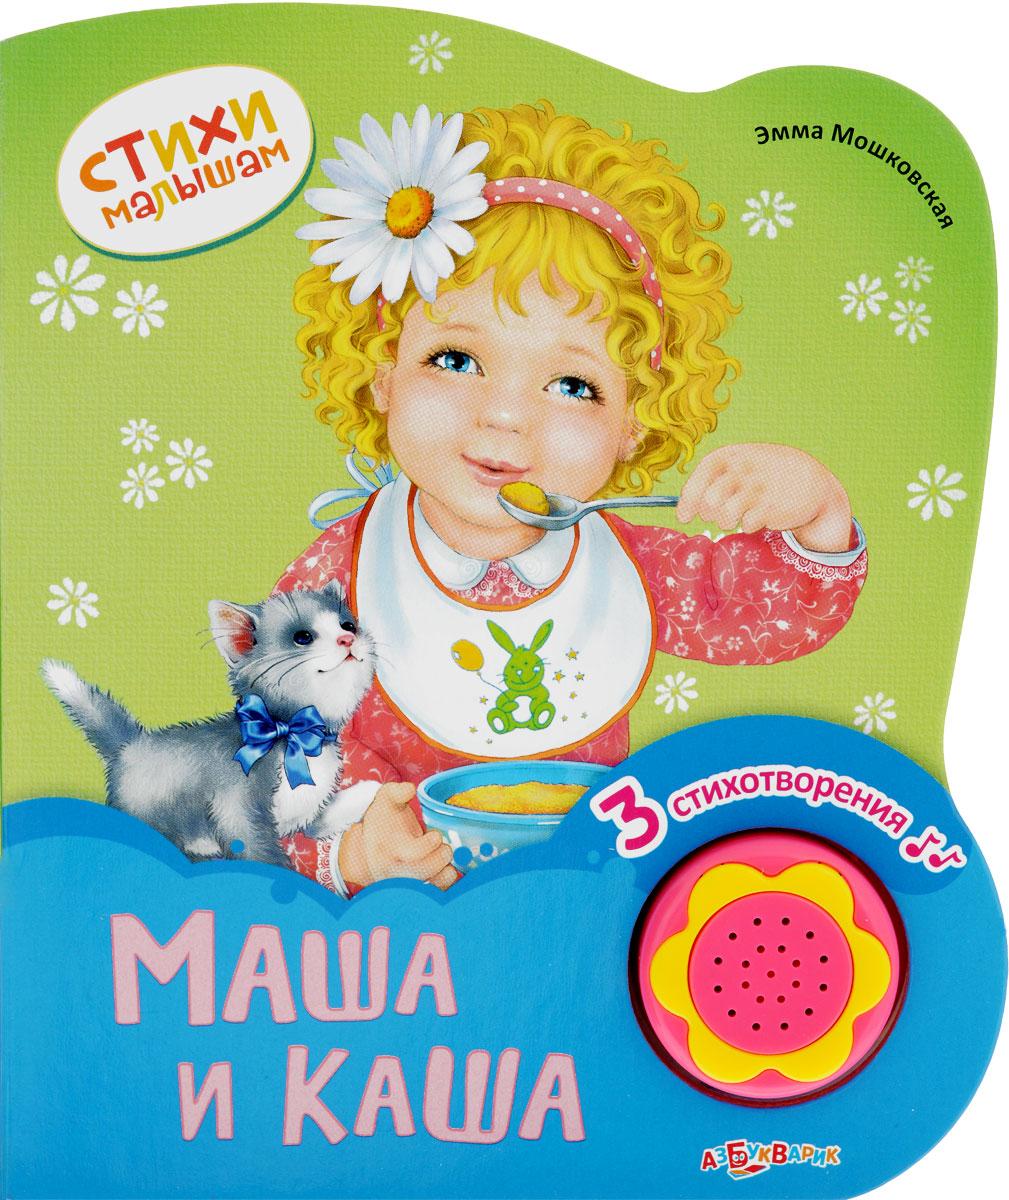 Маша и каша. Книжка-игрушка